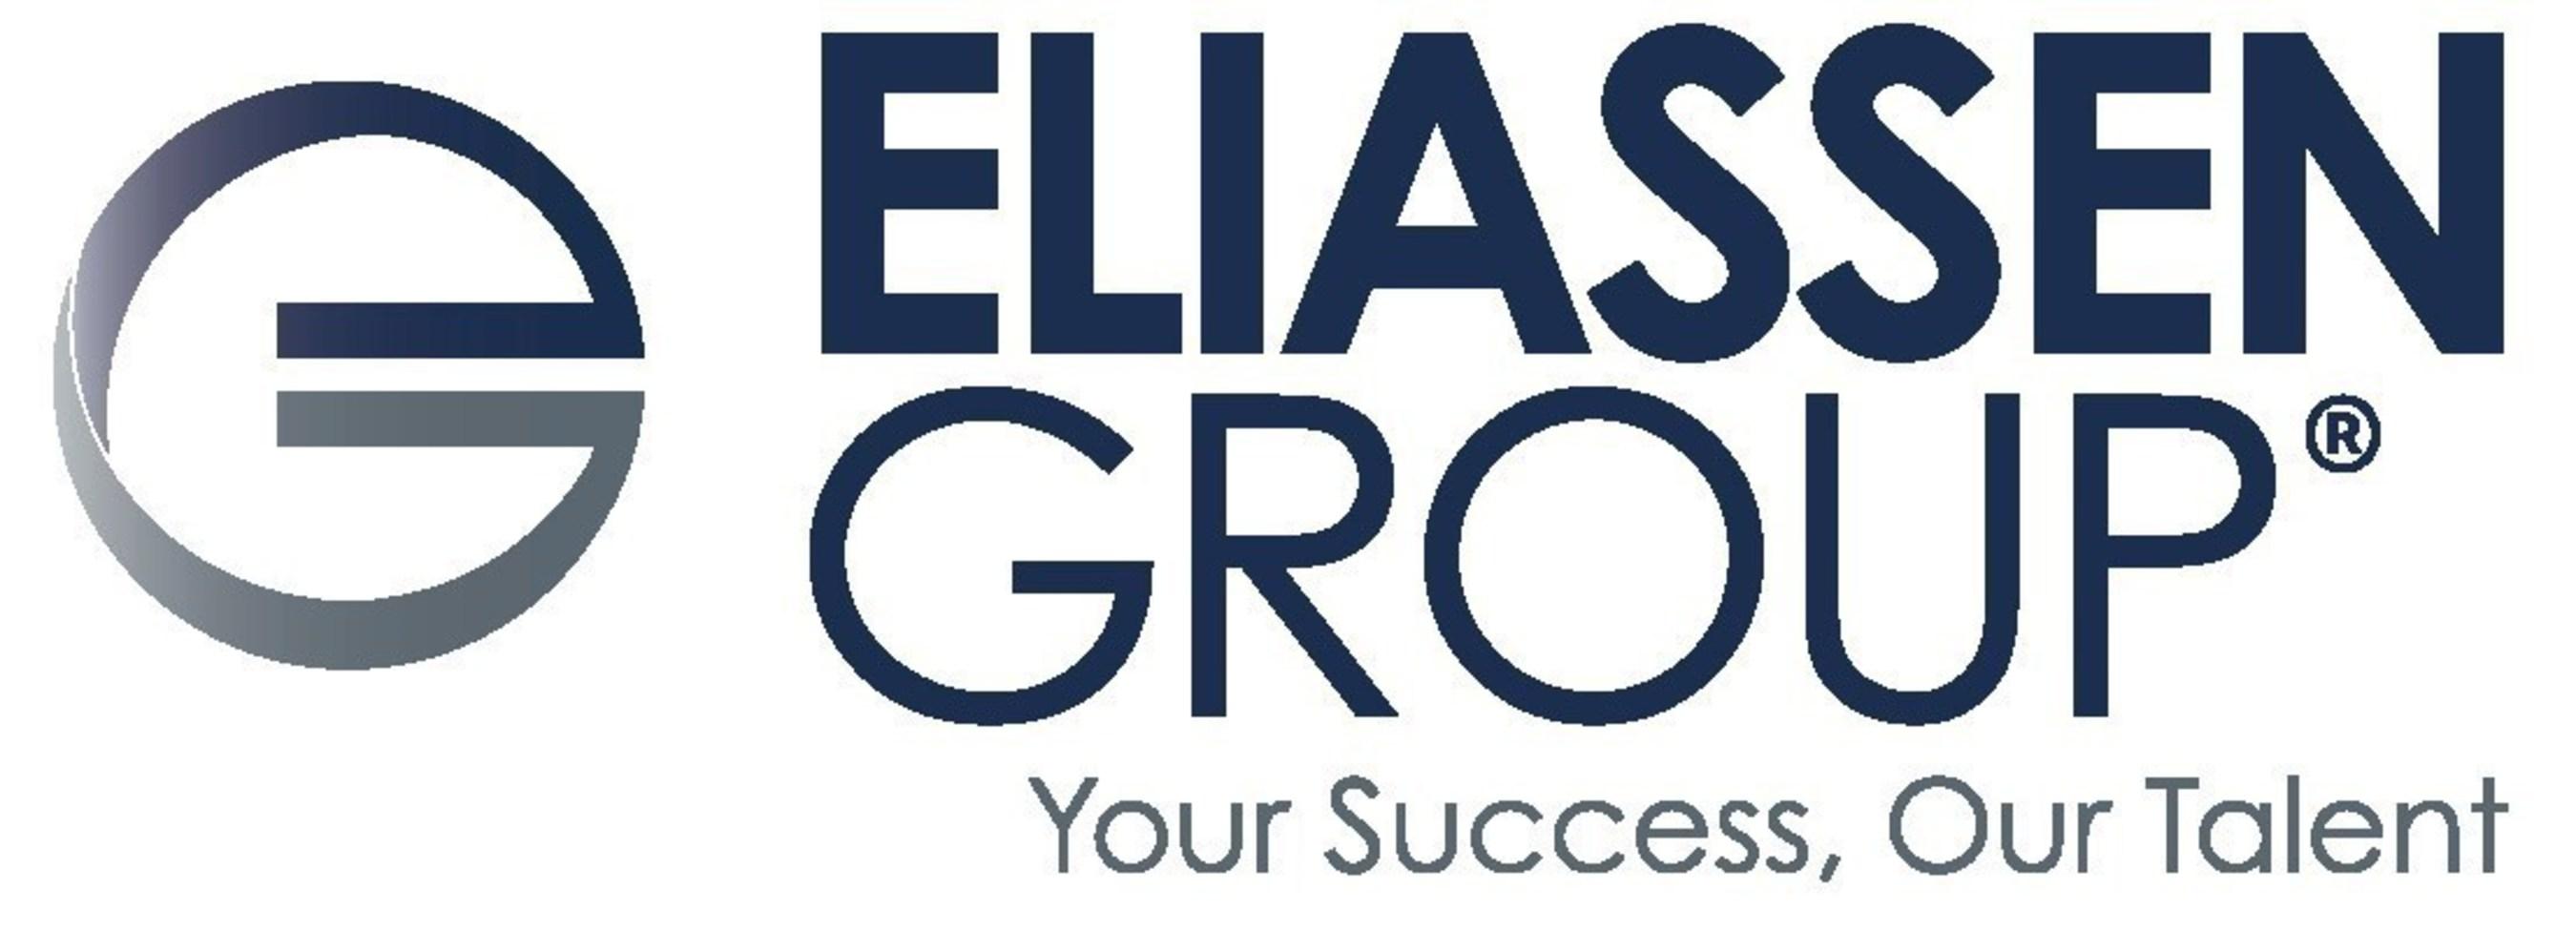 Eliassen Group Awarded MA Workforce Training Fund Grant